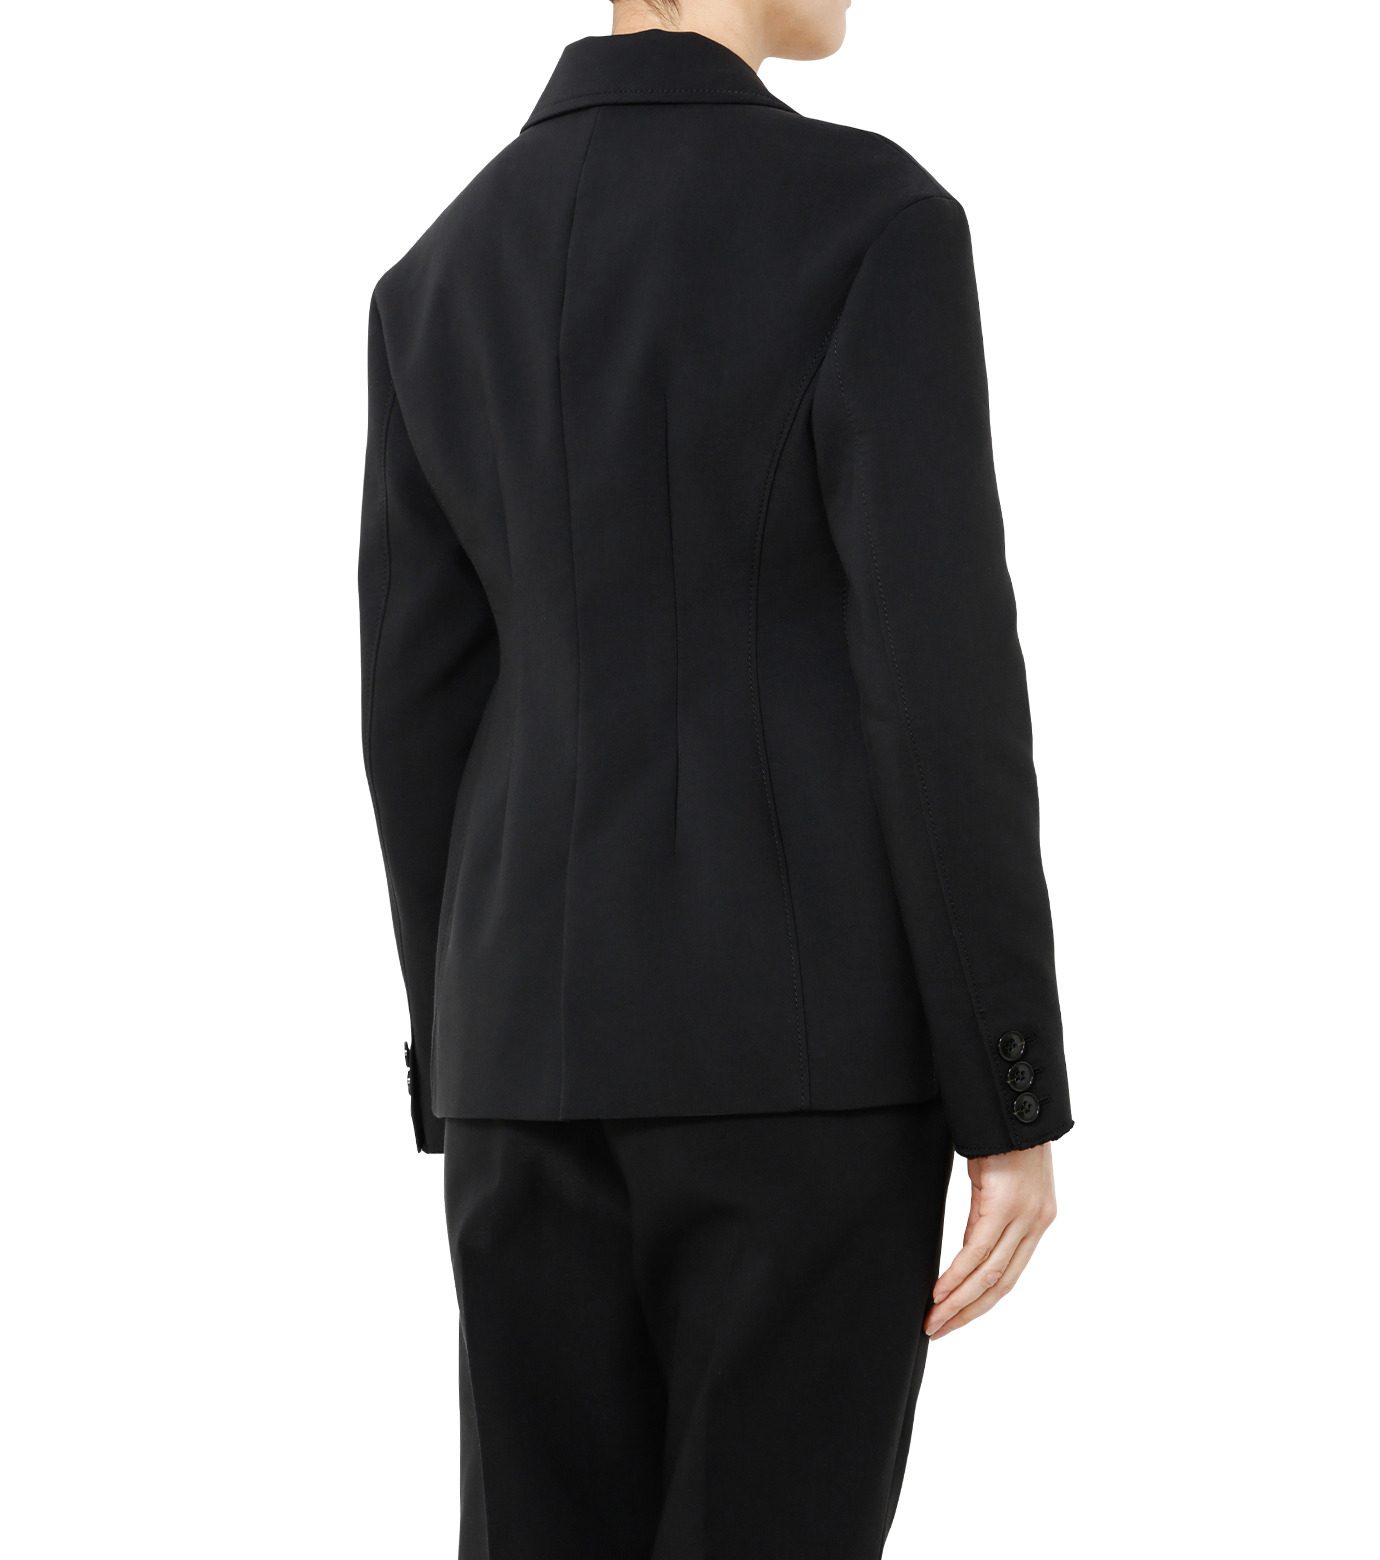 LE CIEL BLEU(ルシェルブルー)のデフォルメラインテーラージャケット-BLACK(ジャケット/jacket)-19S64103 拡大詳細画像4